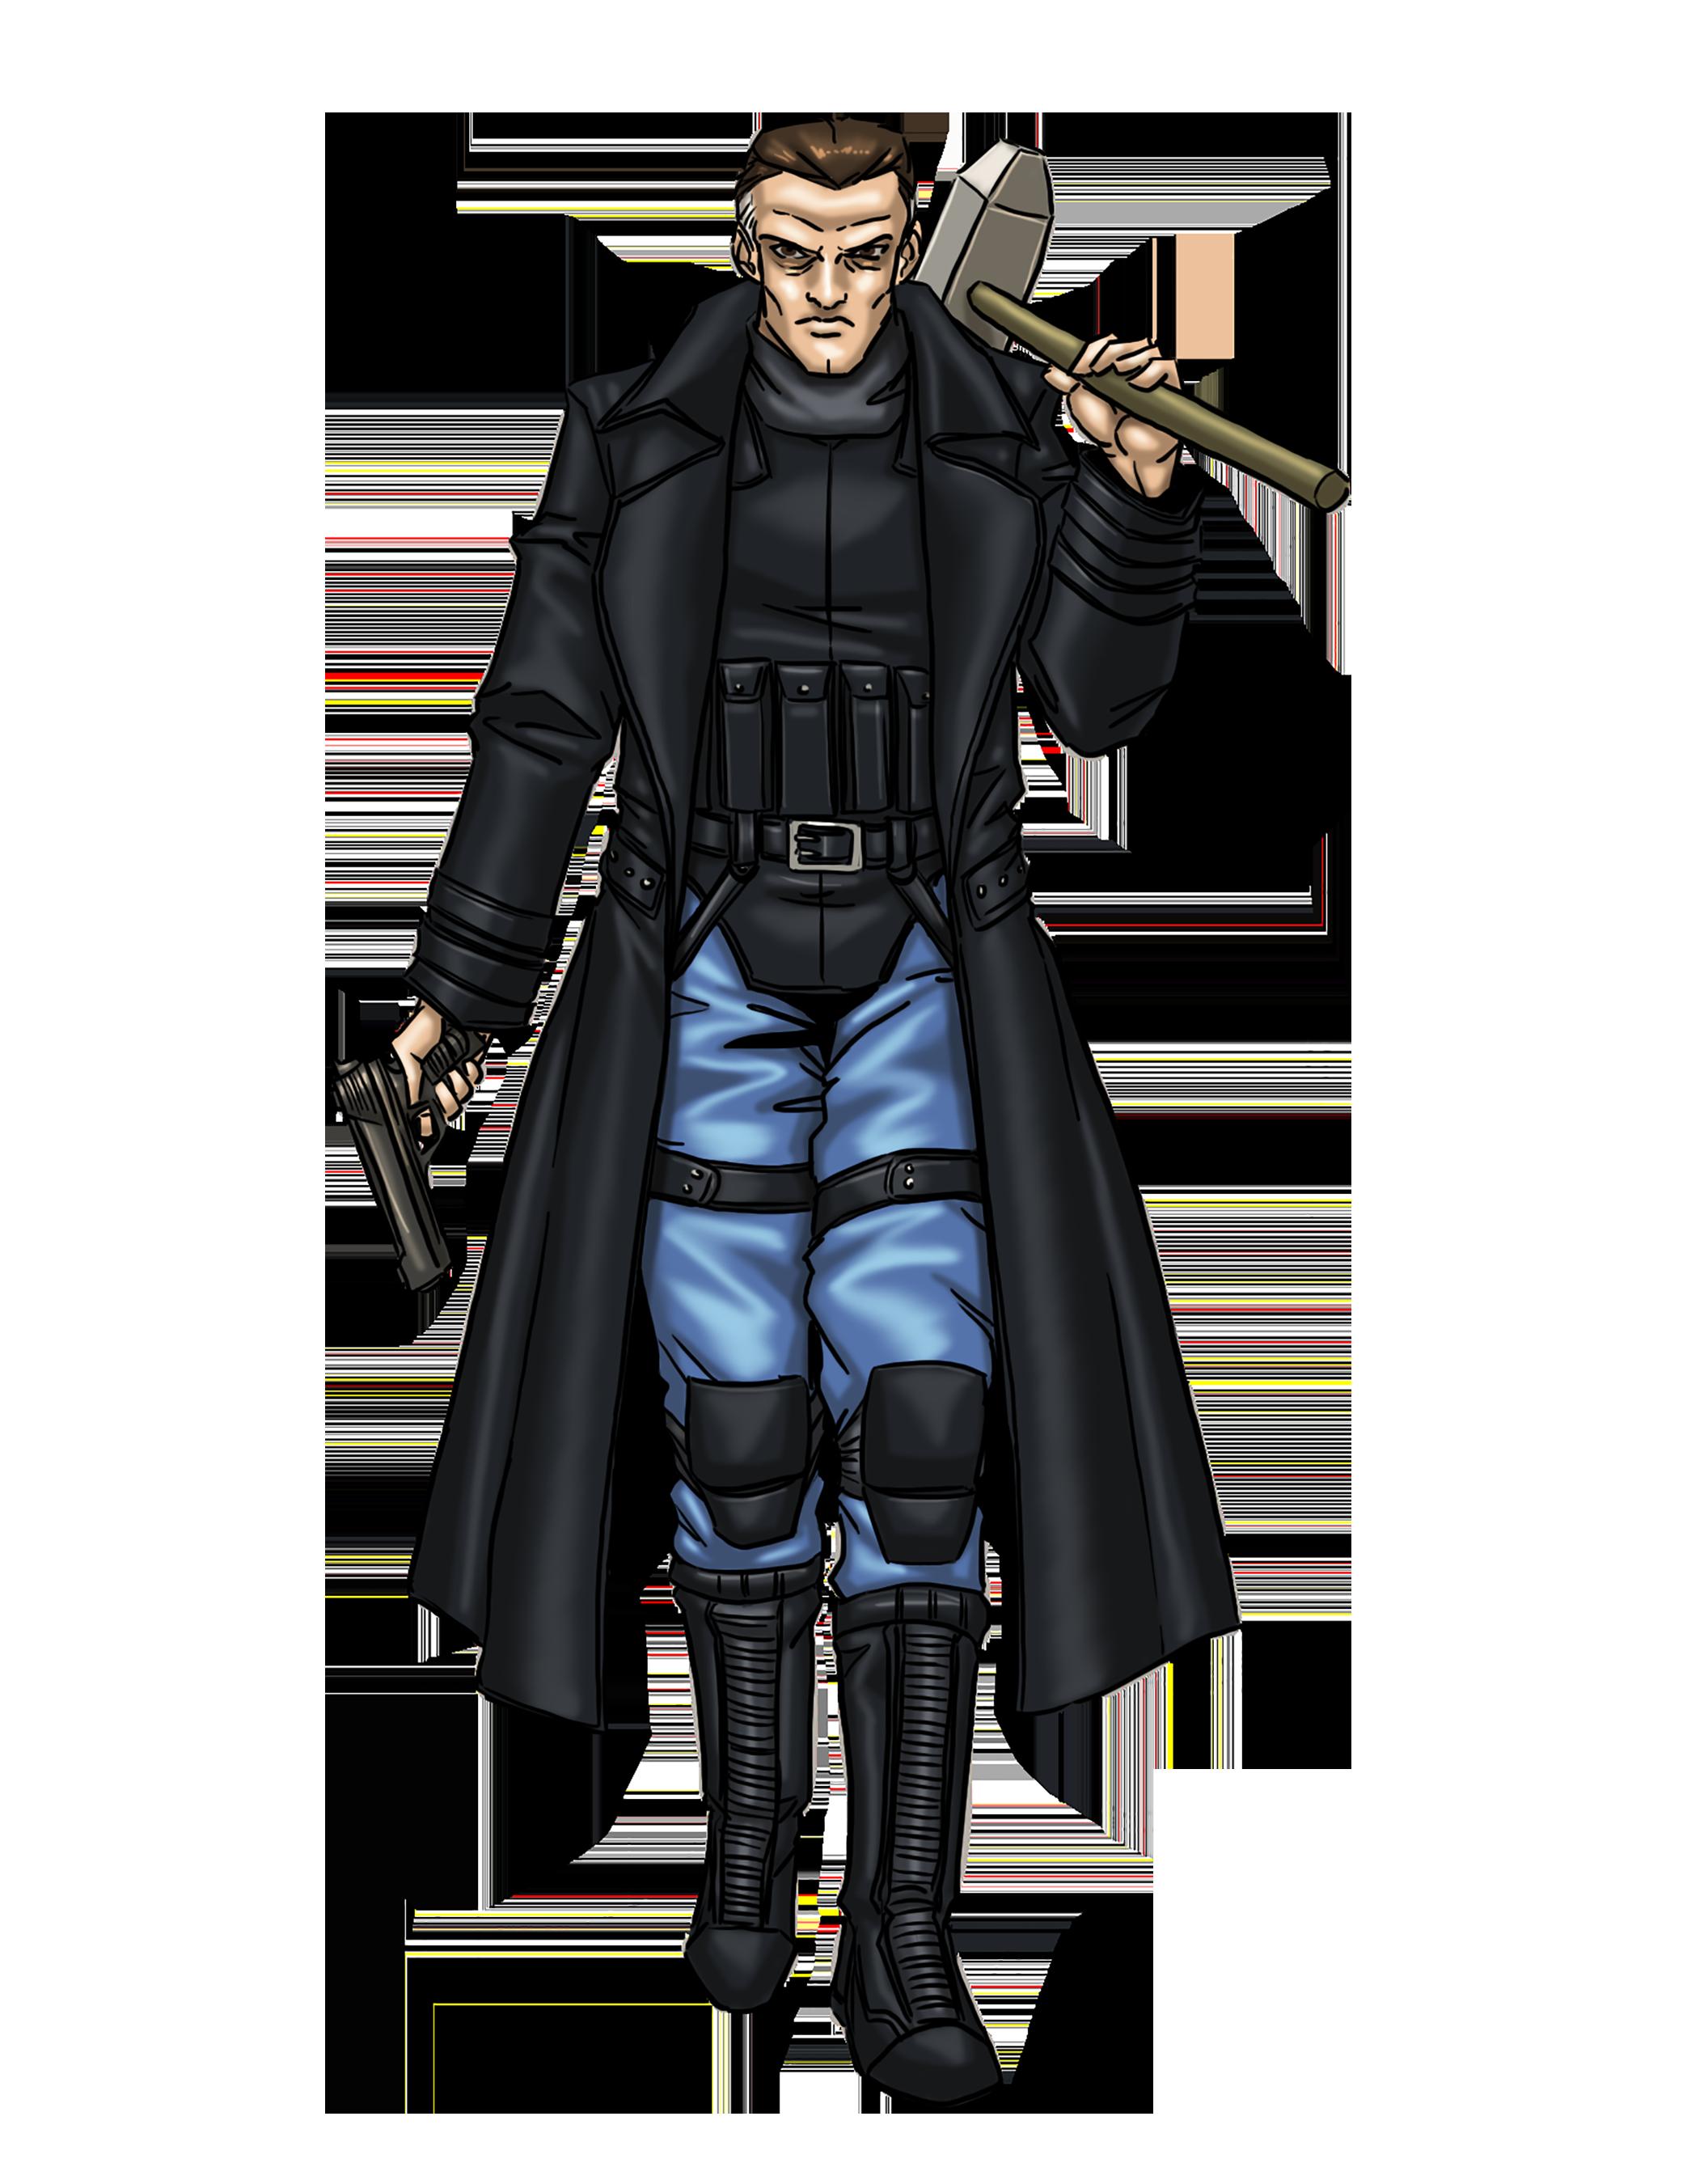 Male Punishing Vigilante color